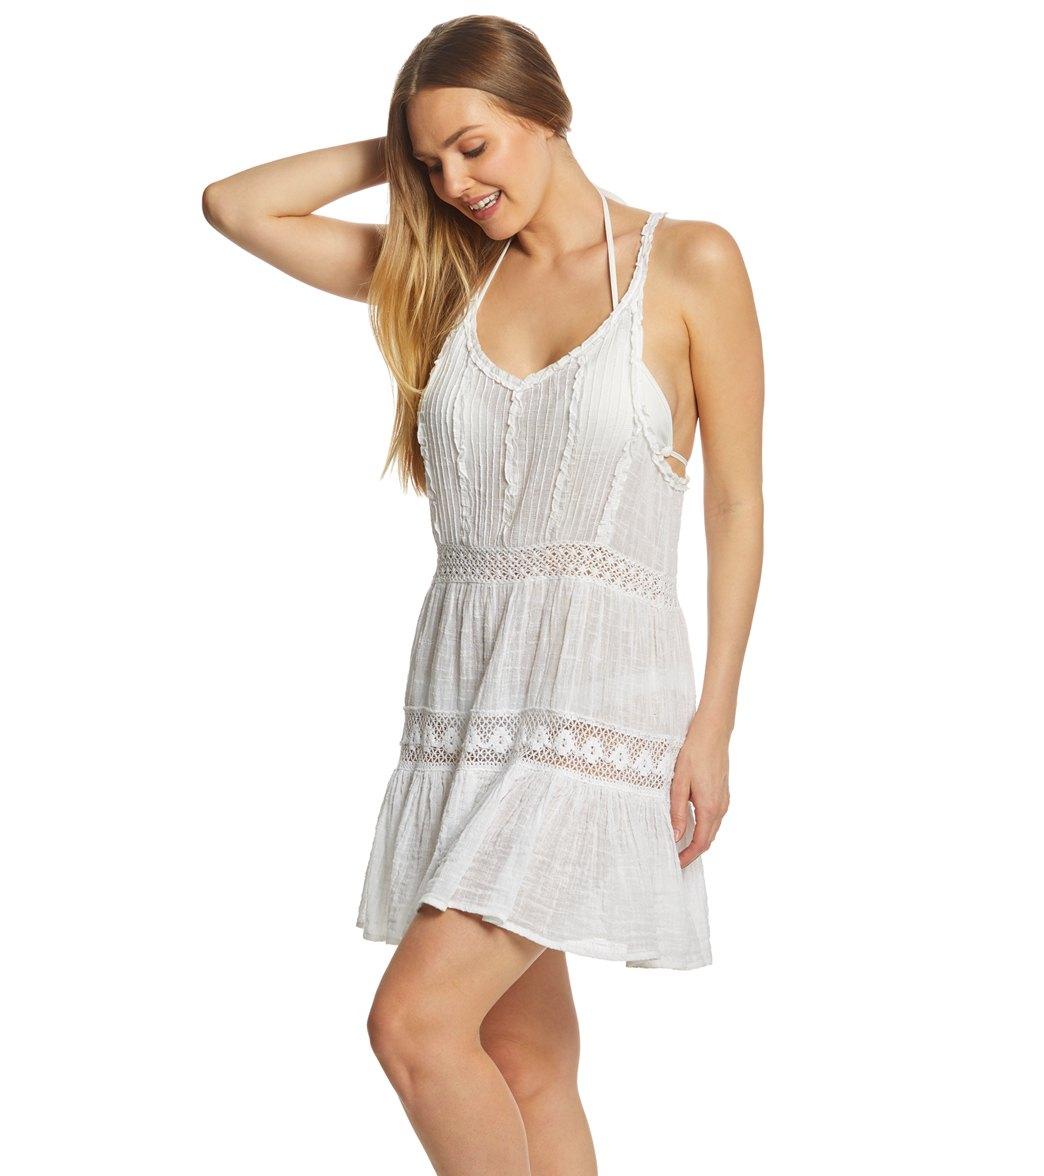 becfaa0993 Polo Ralph Lauren Cotton Slub Coverup Dress at SwimOutlet.com - Free ...